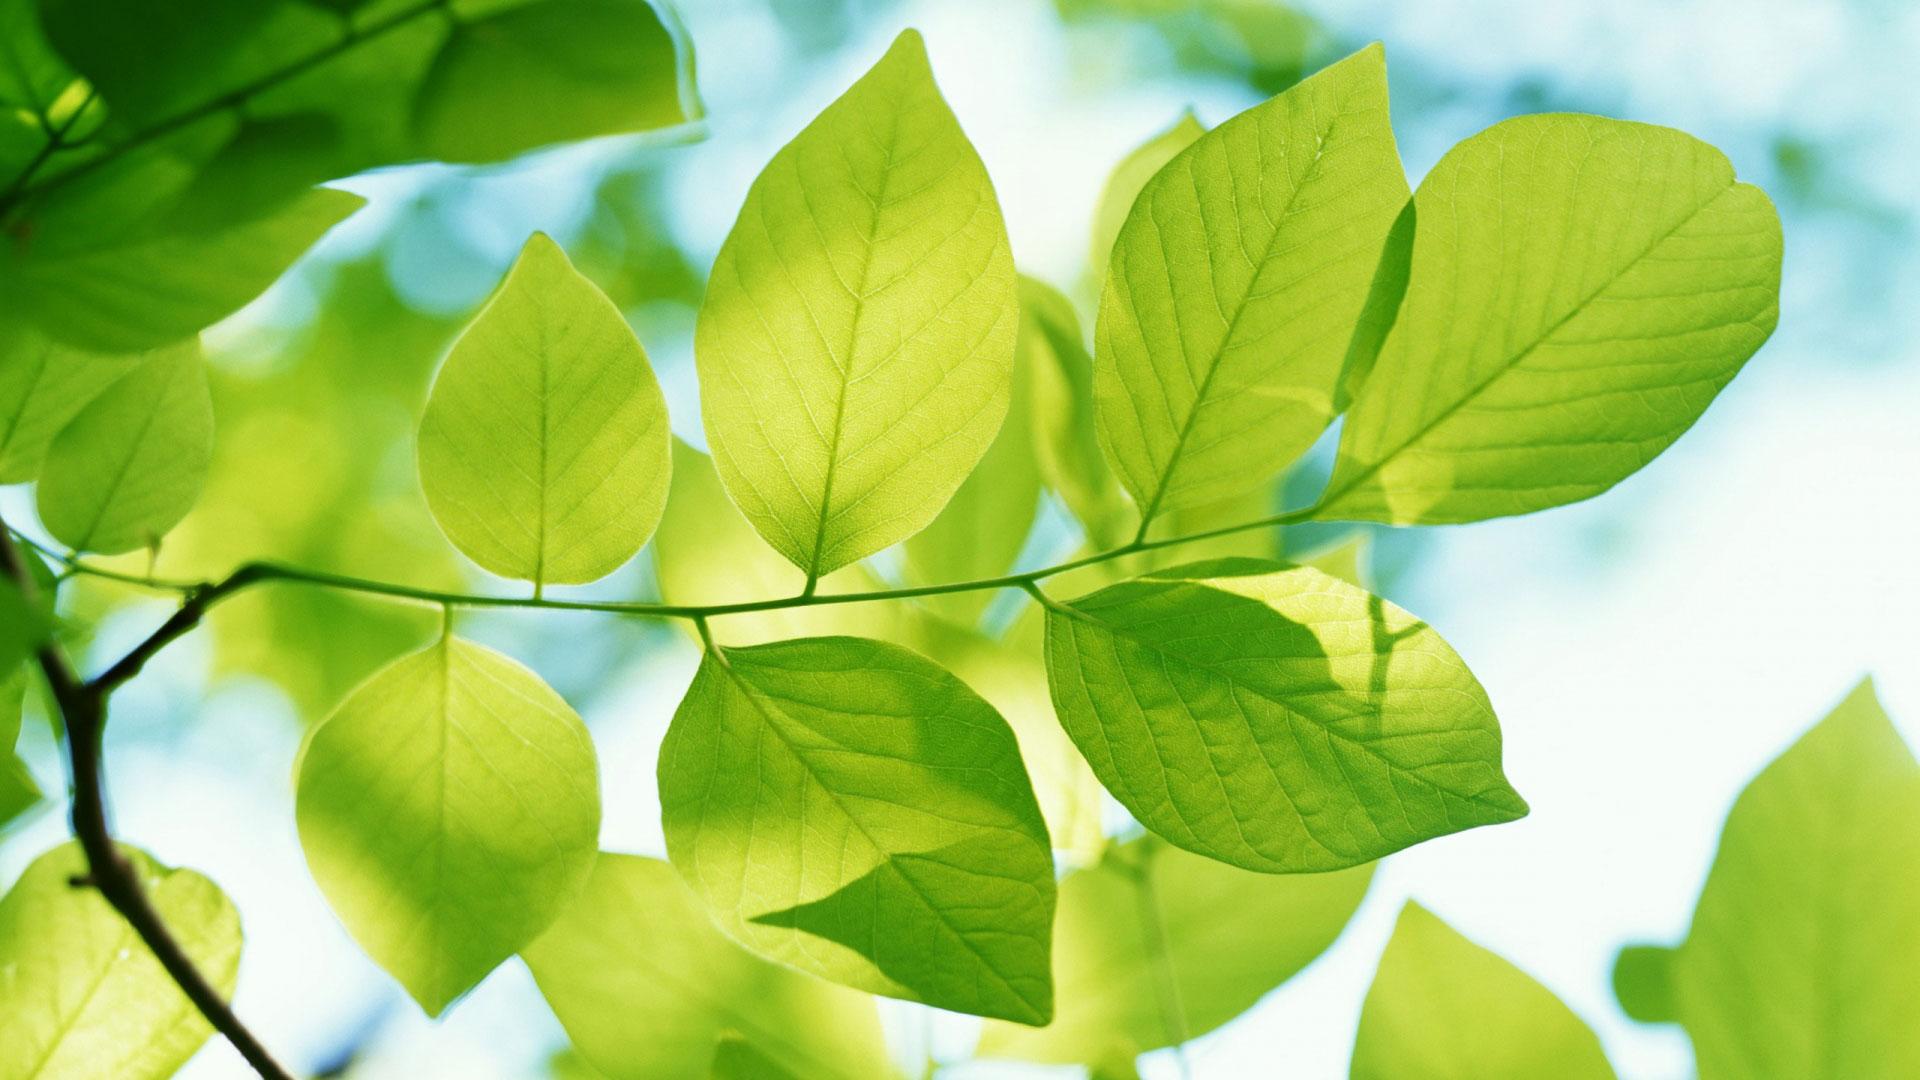 leaves green wallpaper autumn wallpapers walls 1920x1080 1920x1080